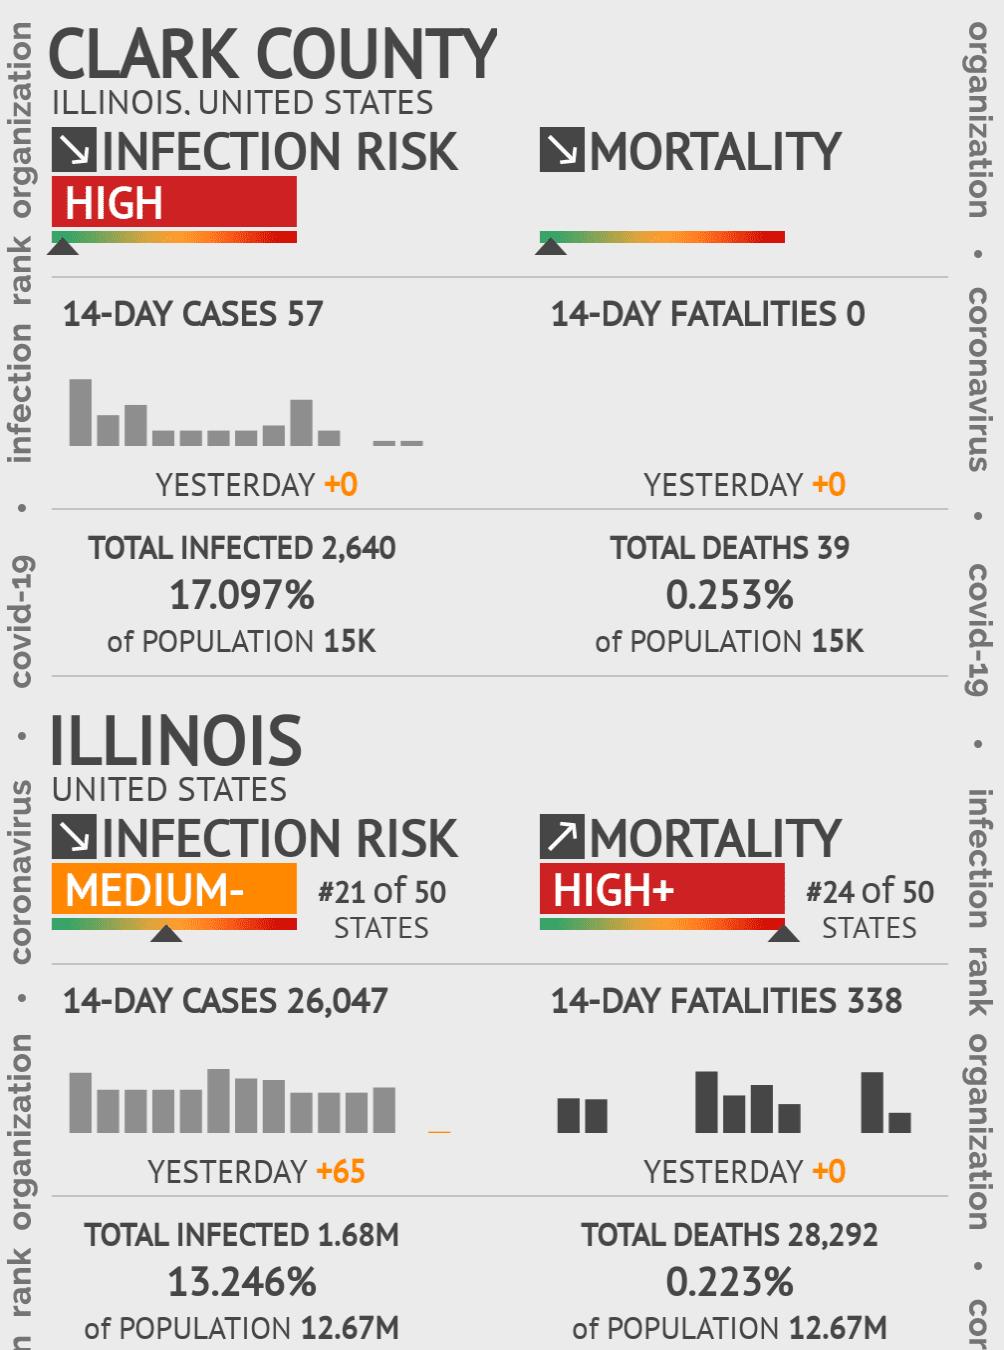 Clark County Coronavirus Covid-19 Risk of Infection on October 23, 2020